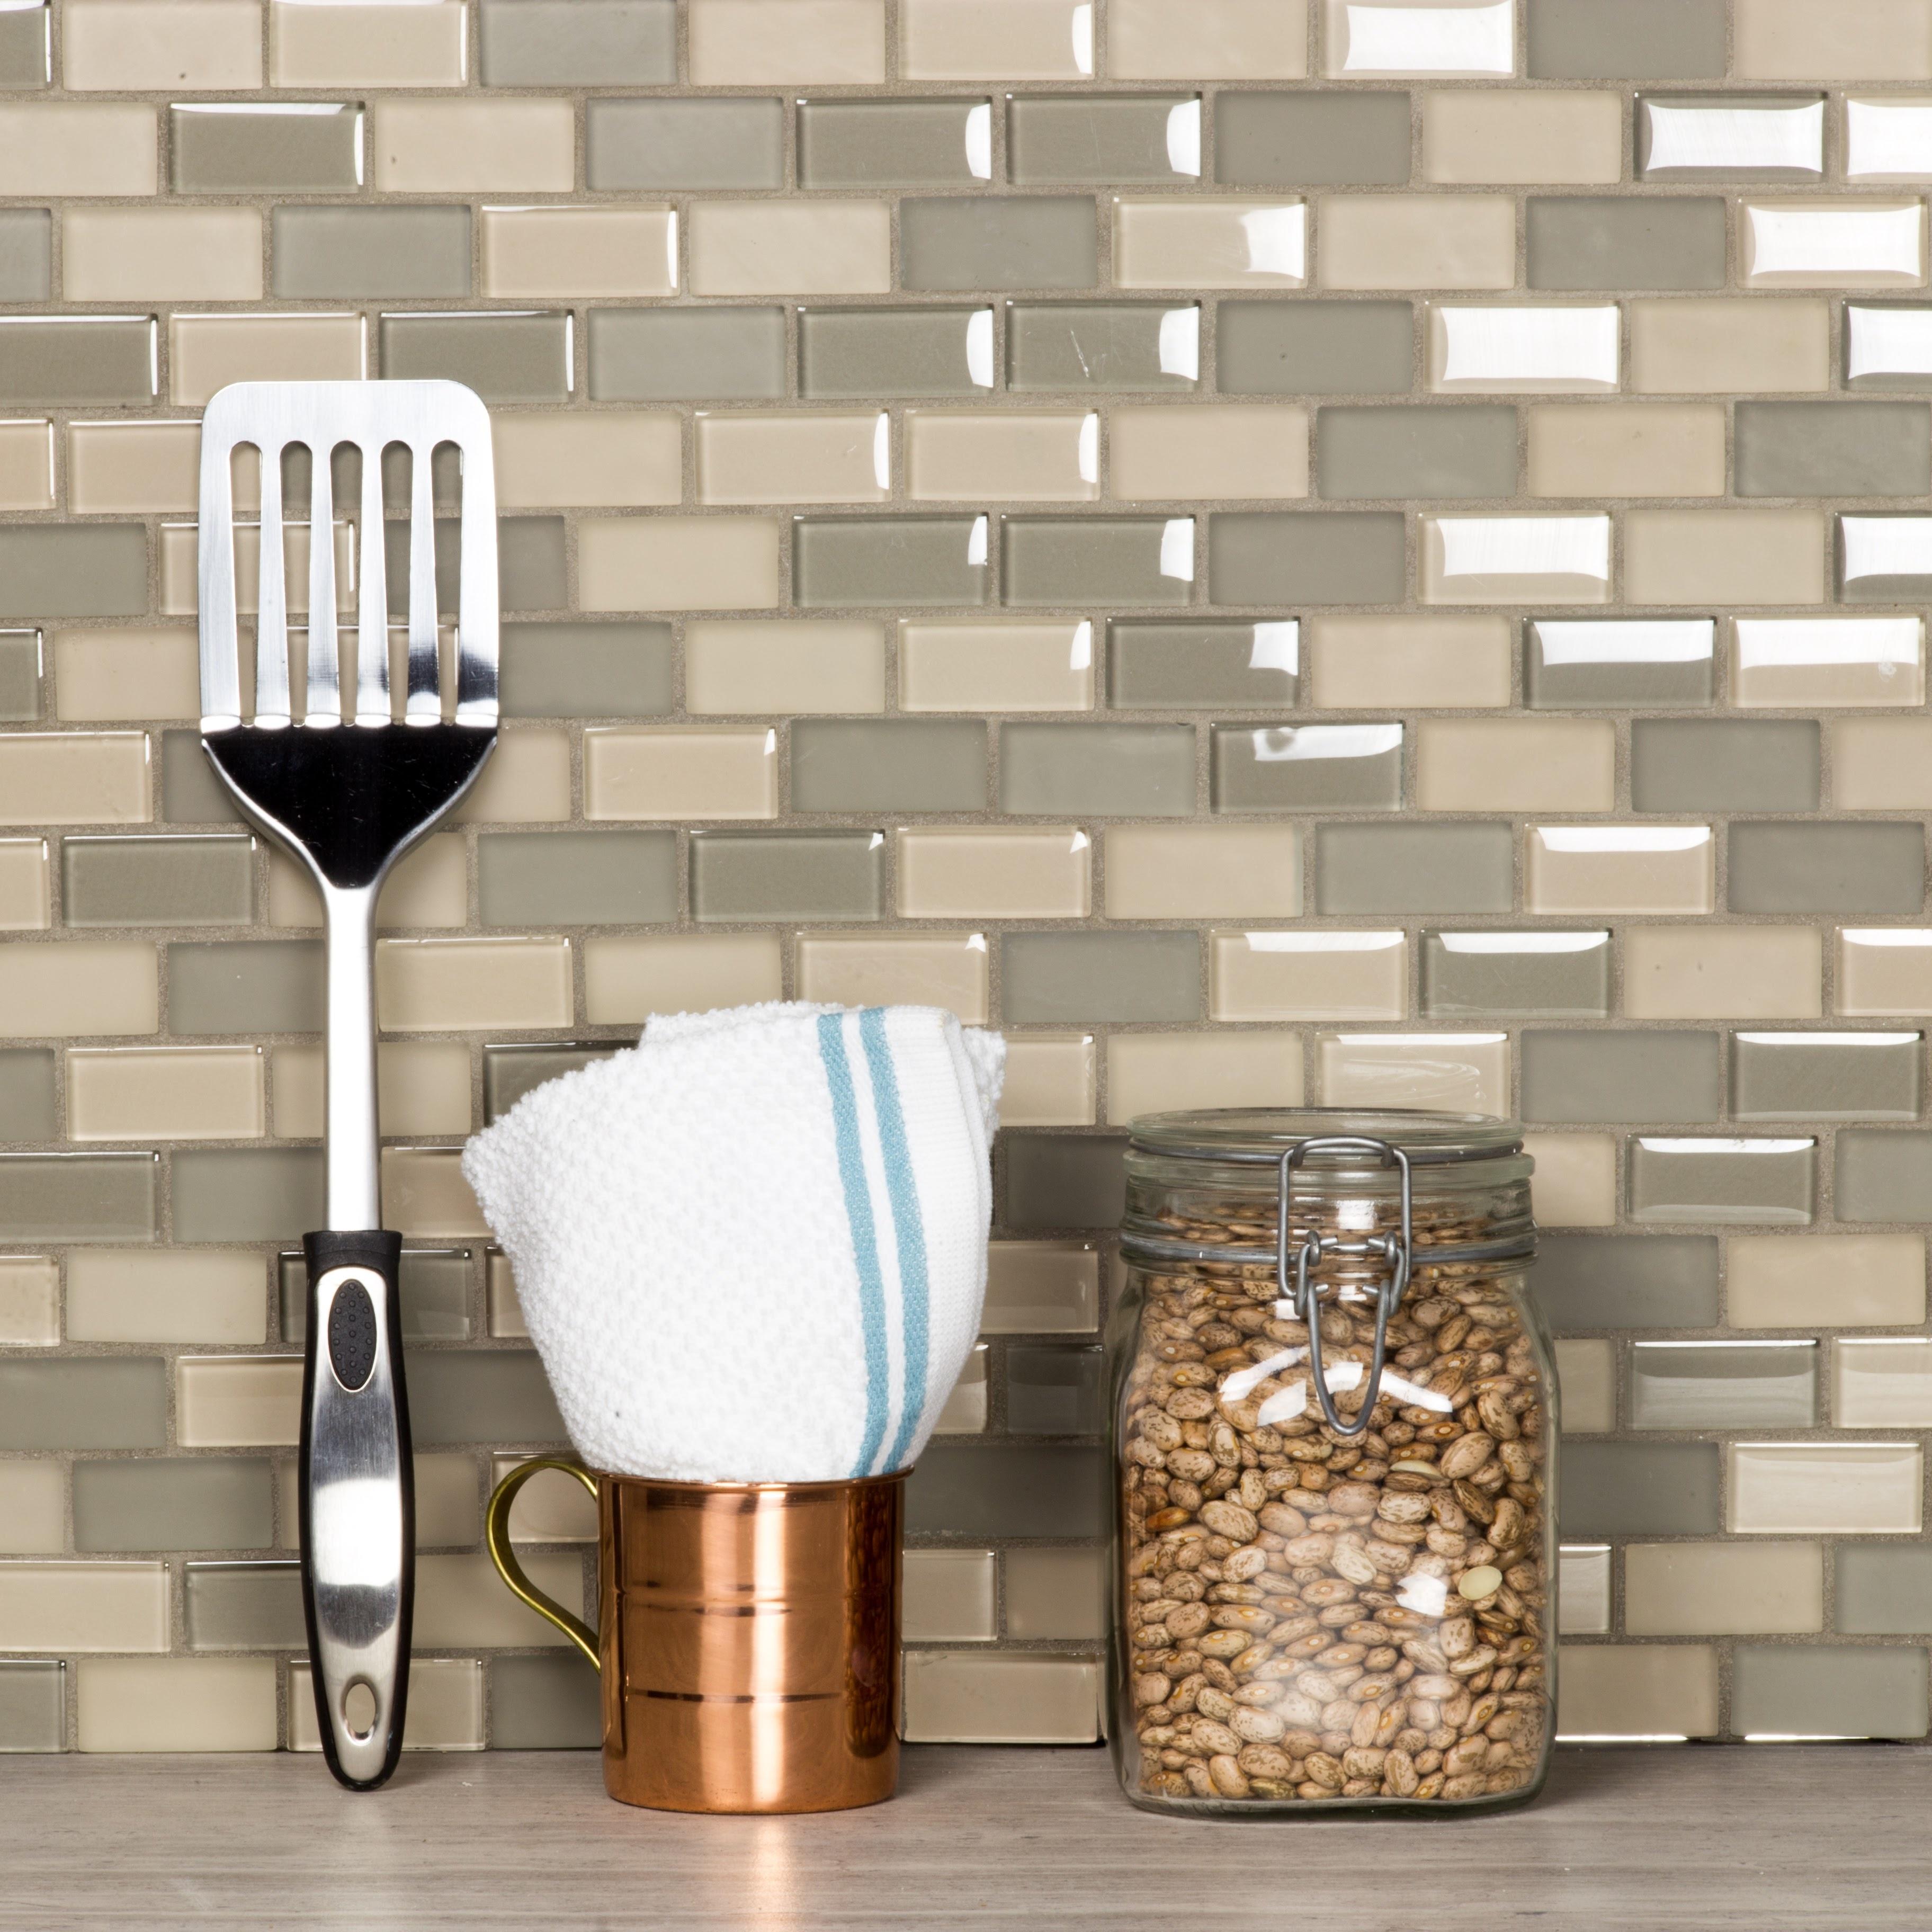 "Free Flow 1"" x 2"" Multi Finish Beige Glass Brick Backsplash Mosaic Wall & Floor Tile"